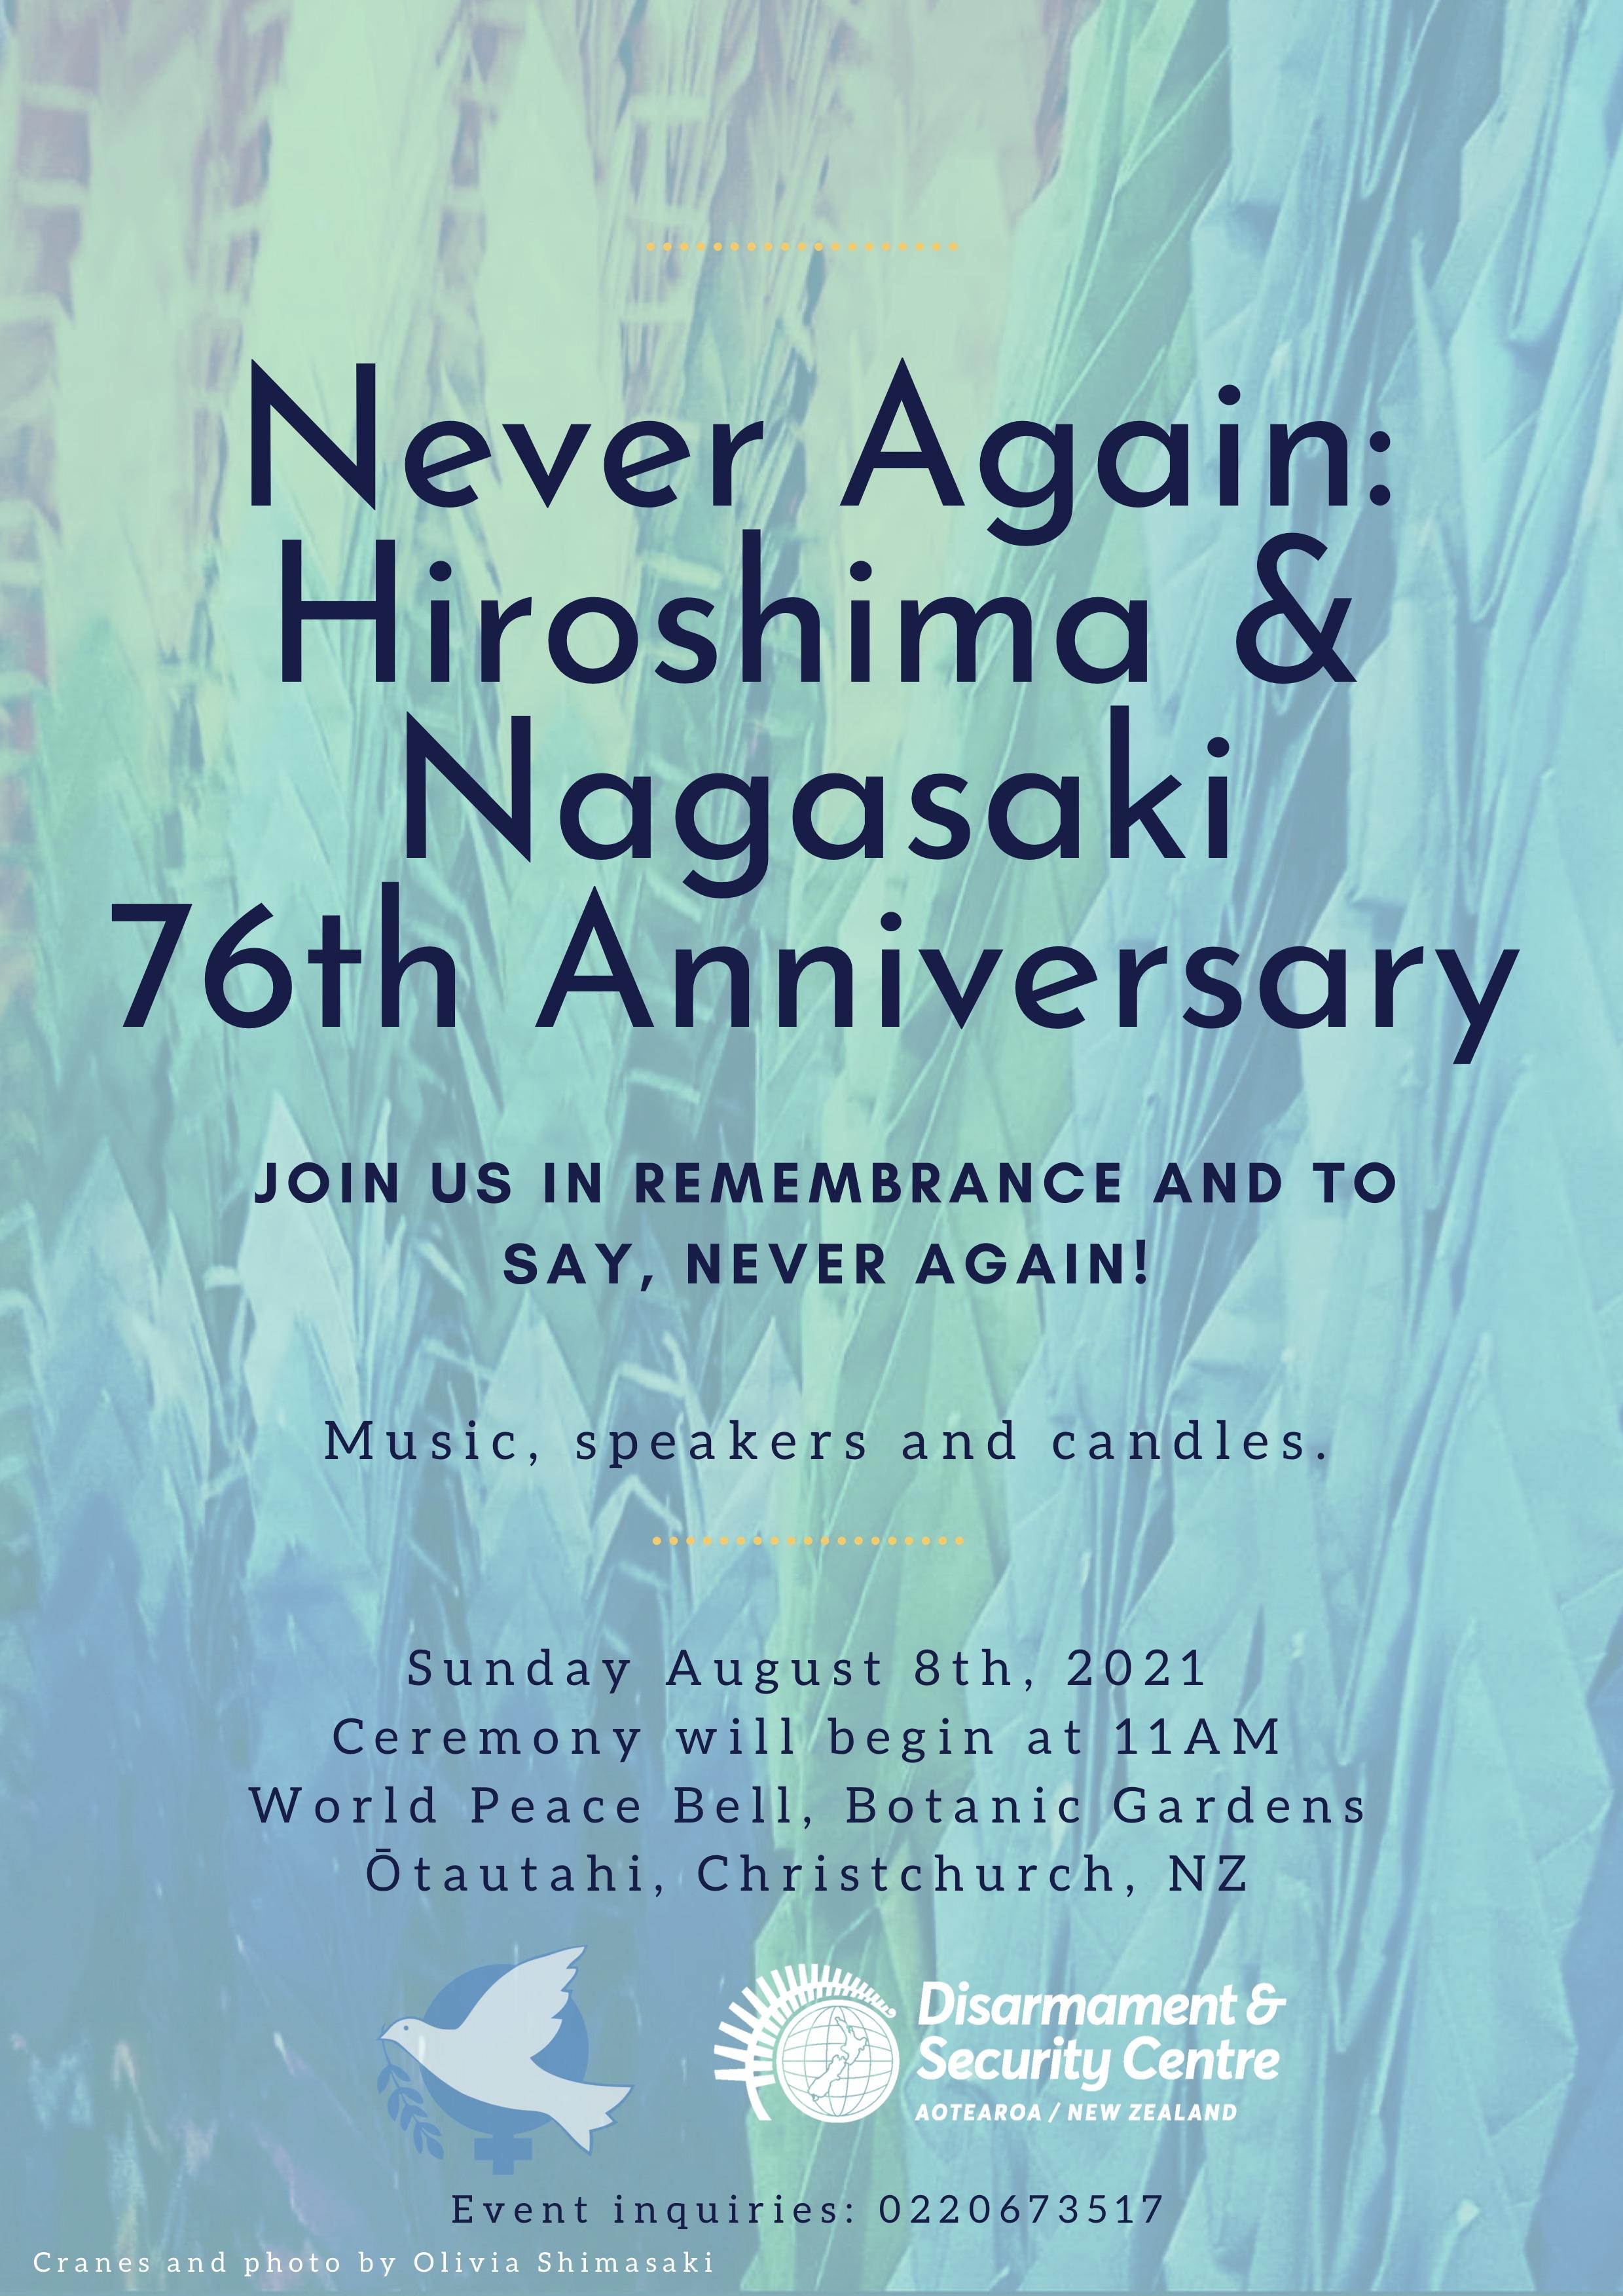 Hiroshima and Nagasaki Commemoration